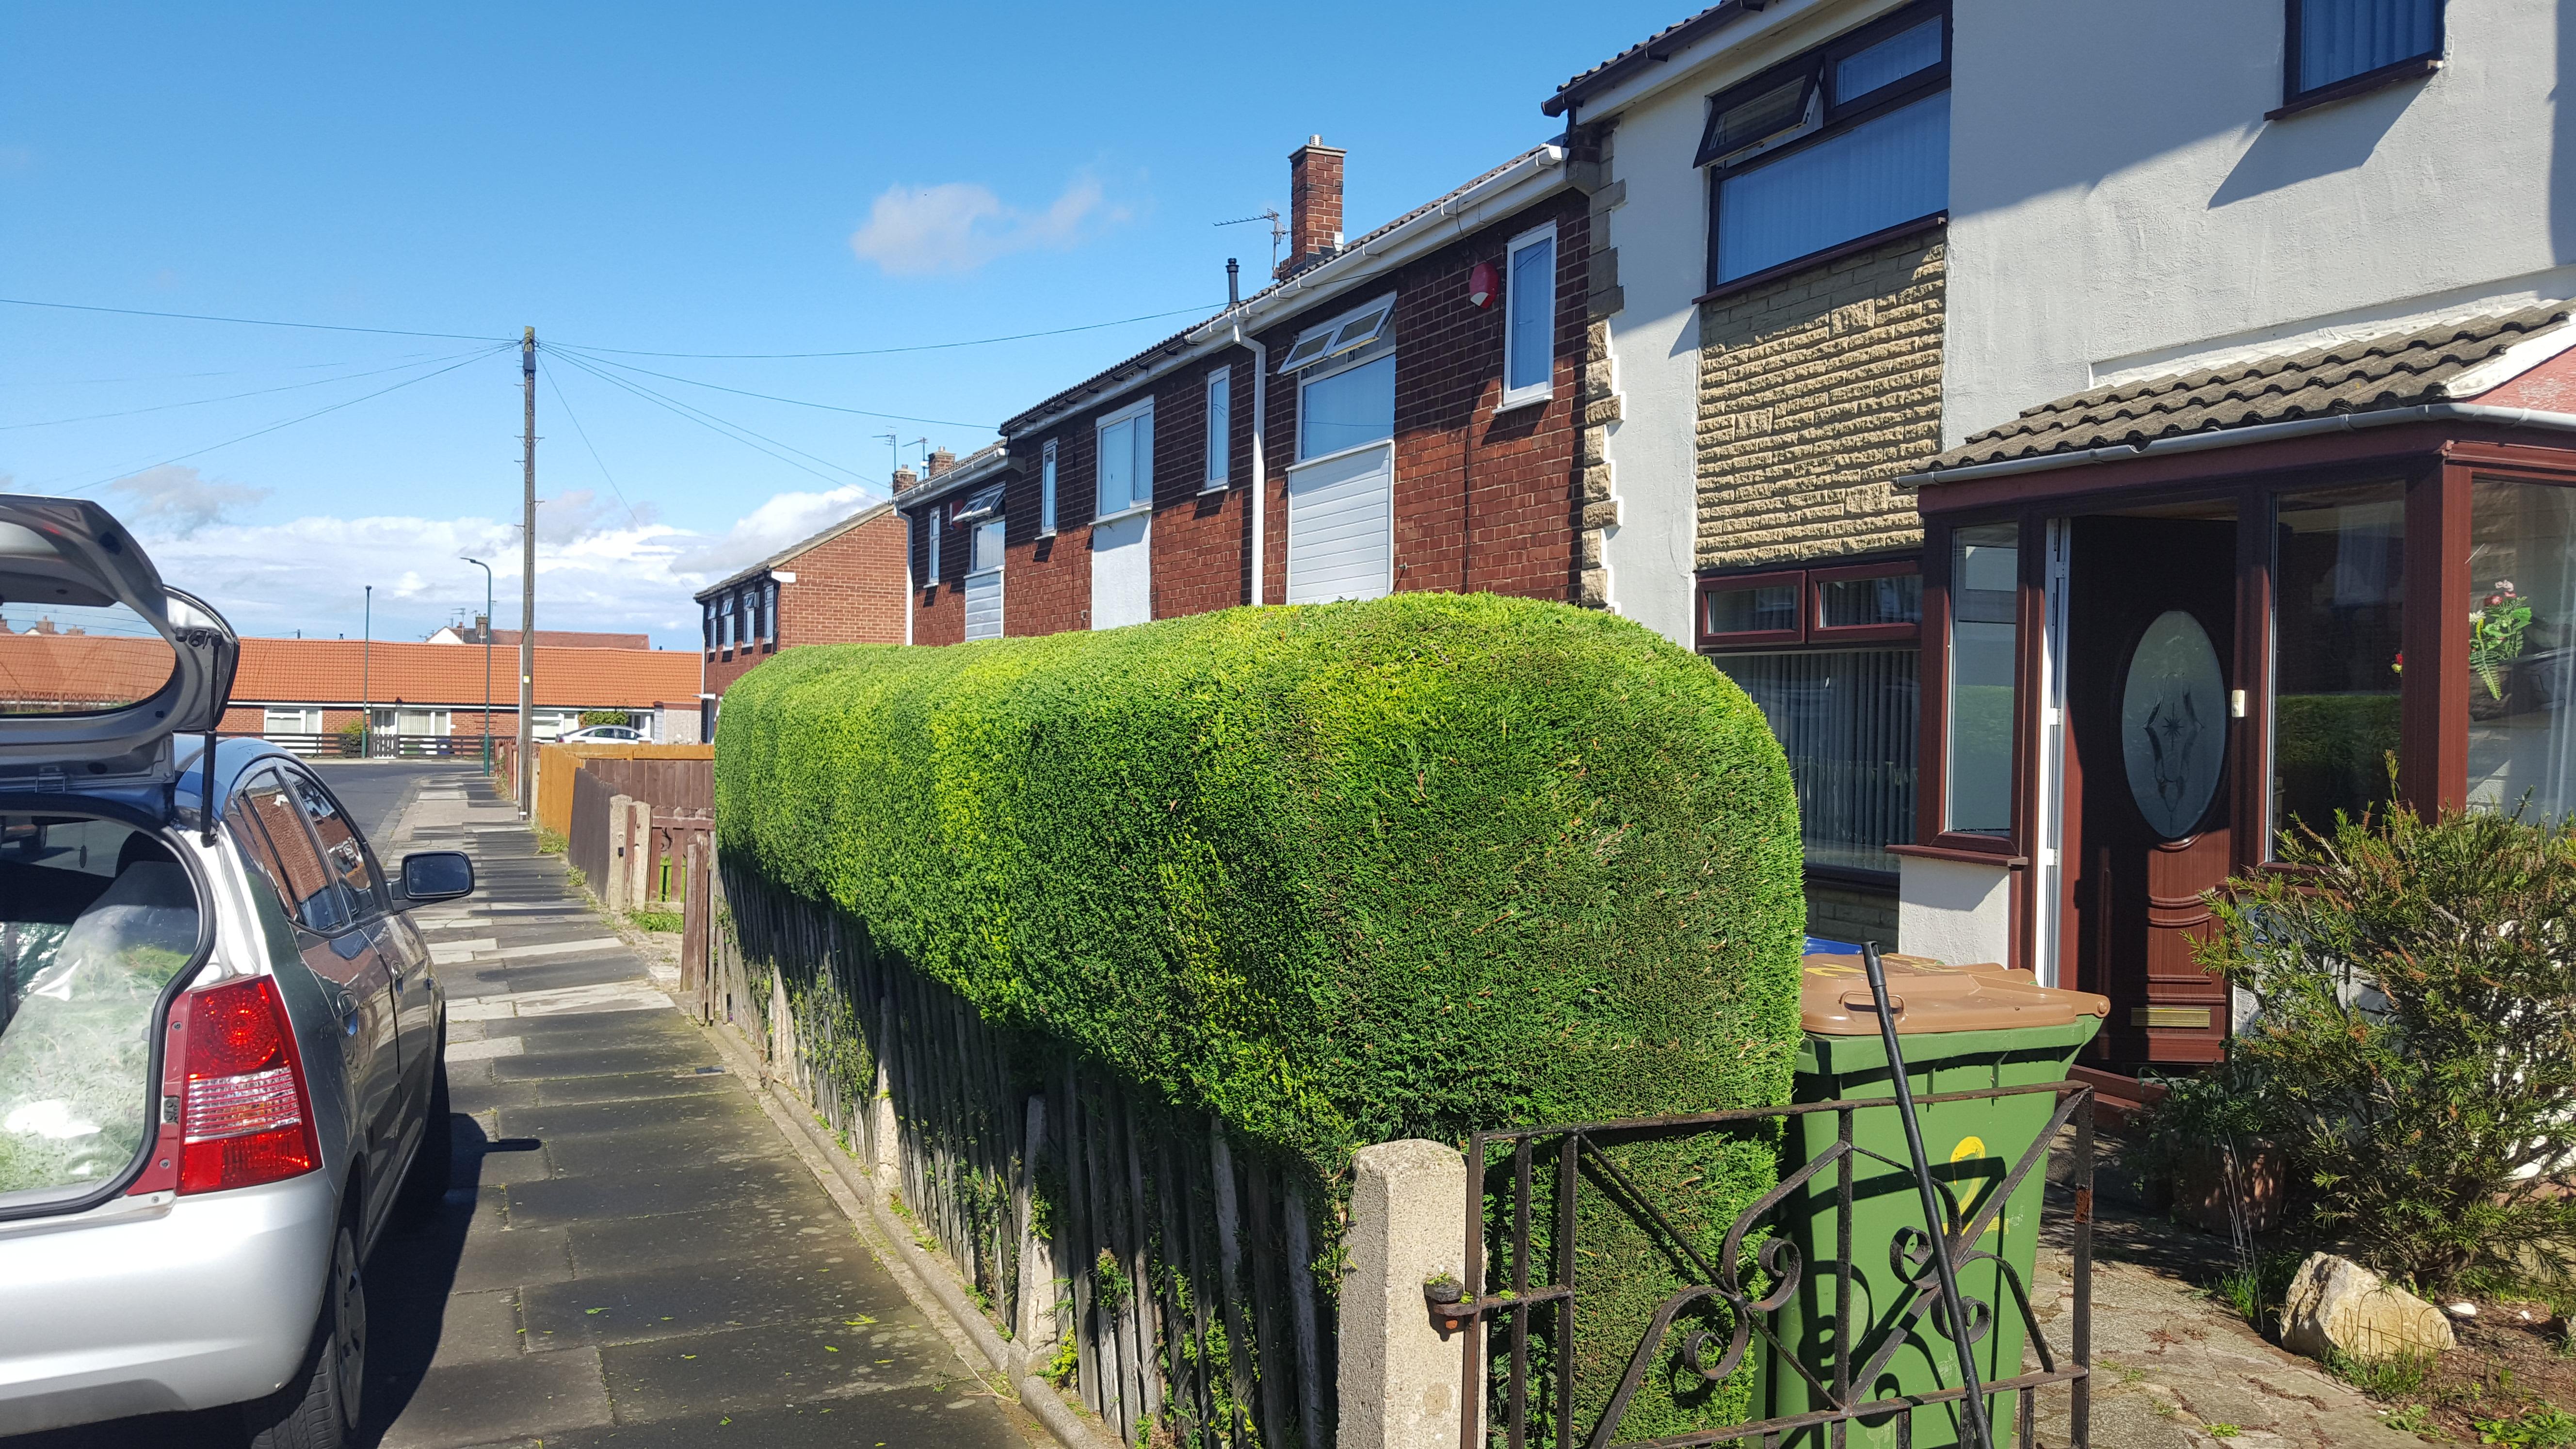 Leylandii Hedge Trimming